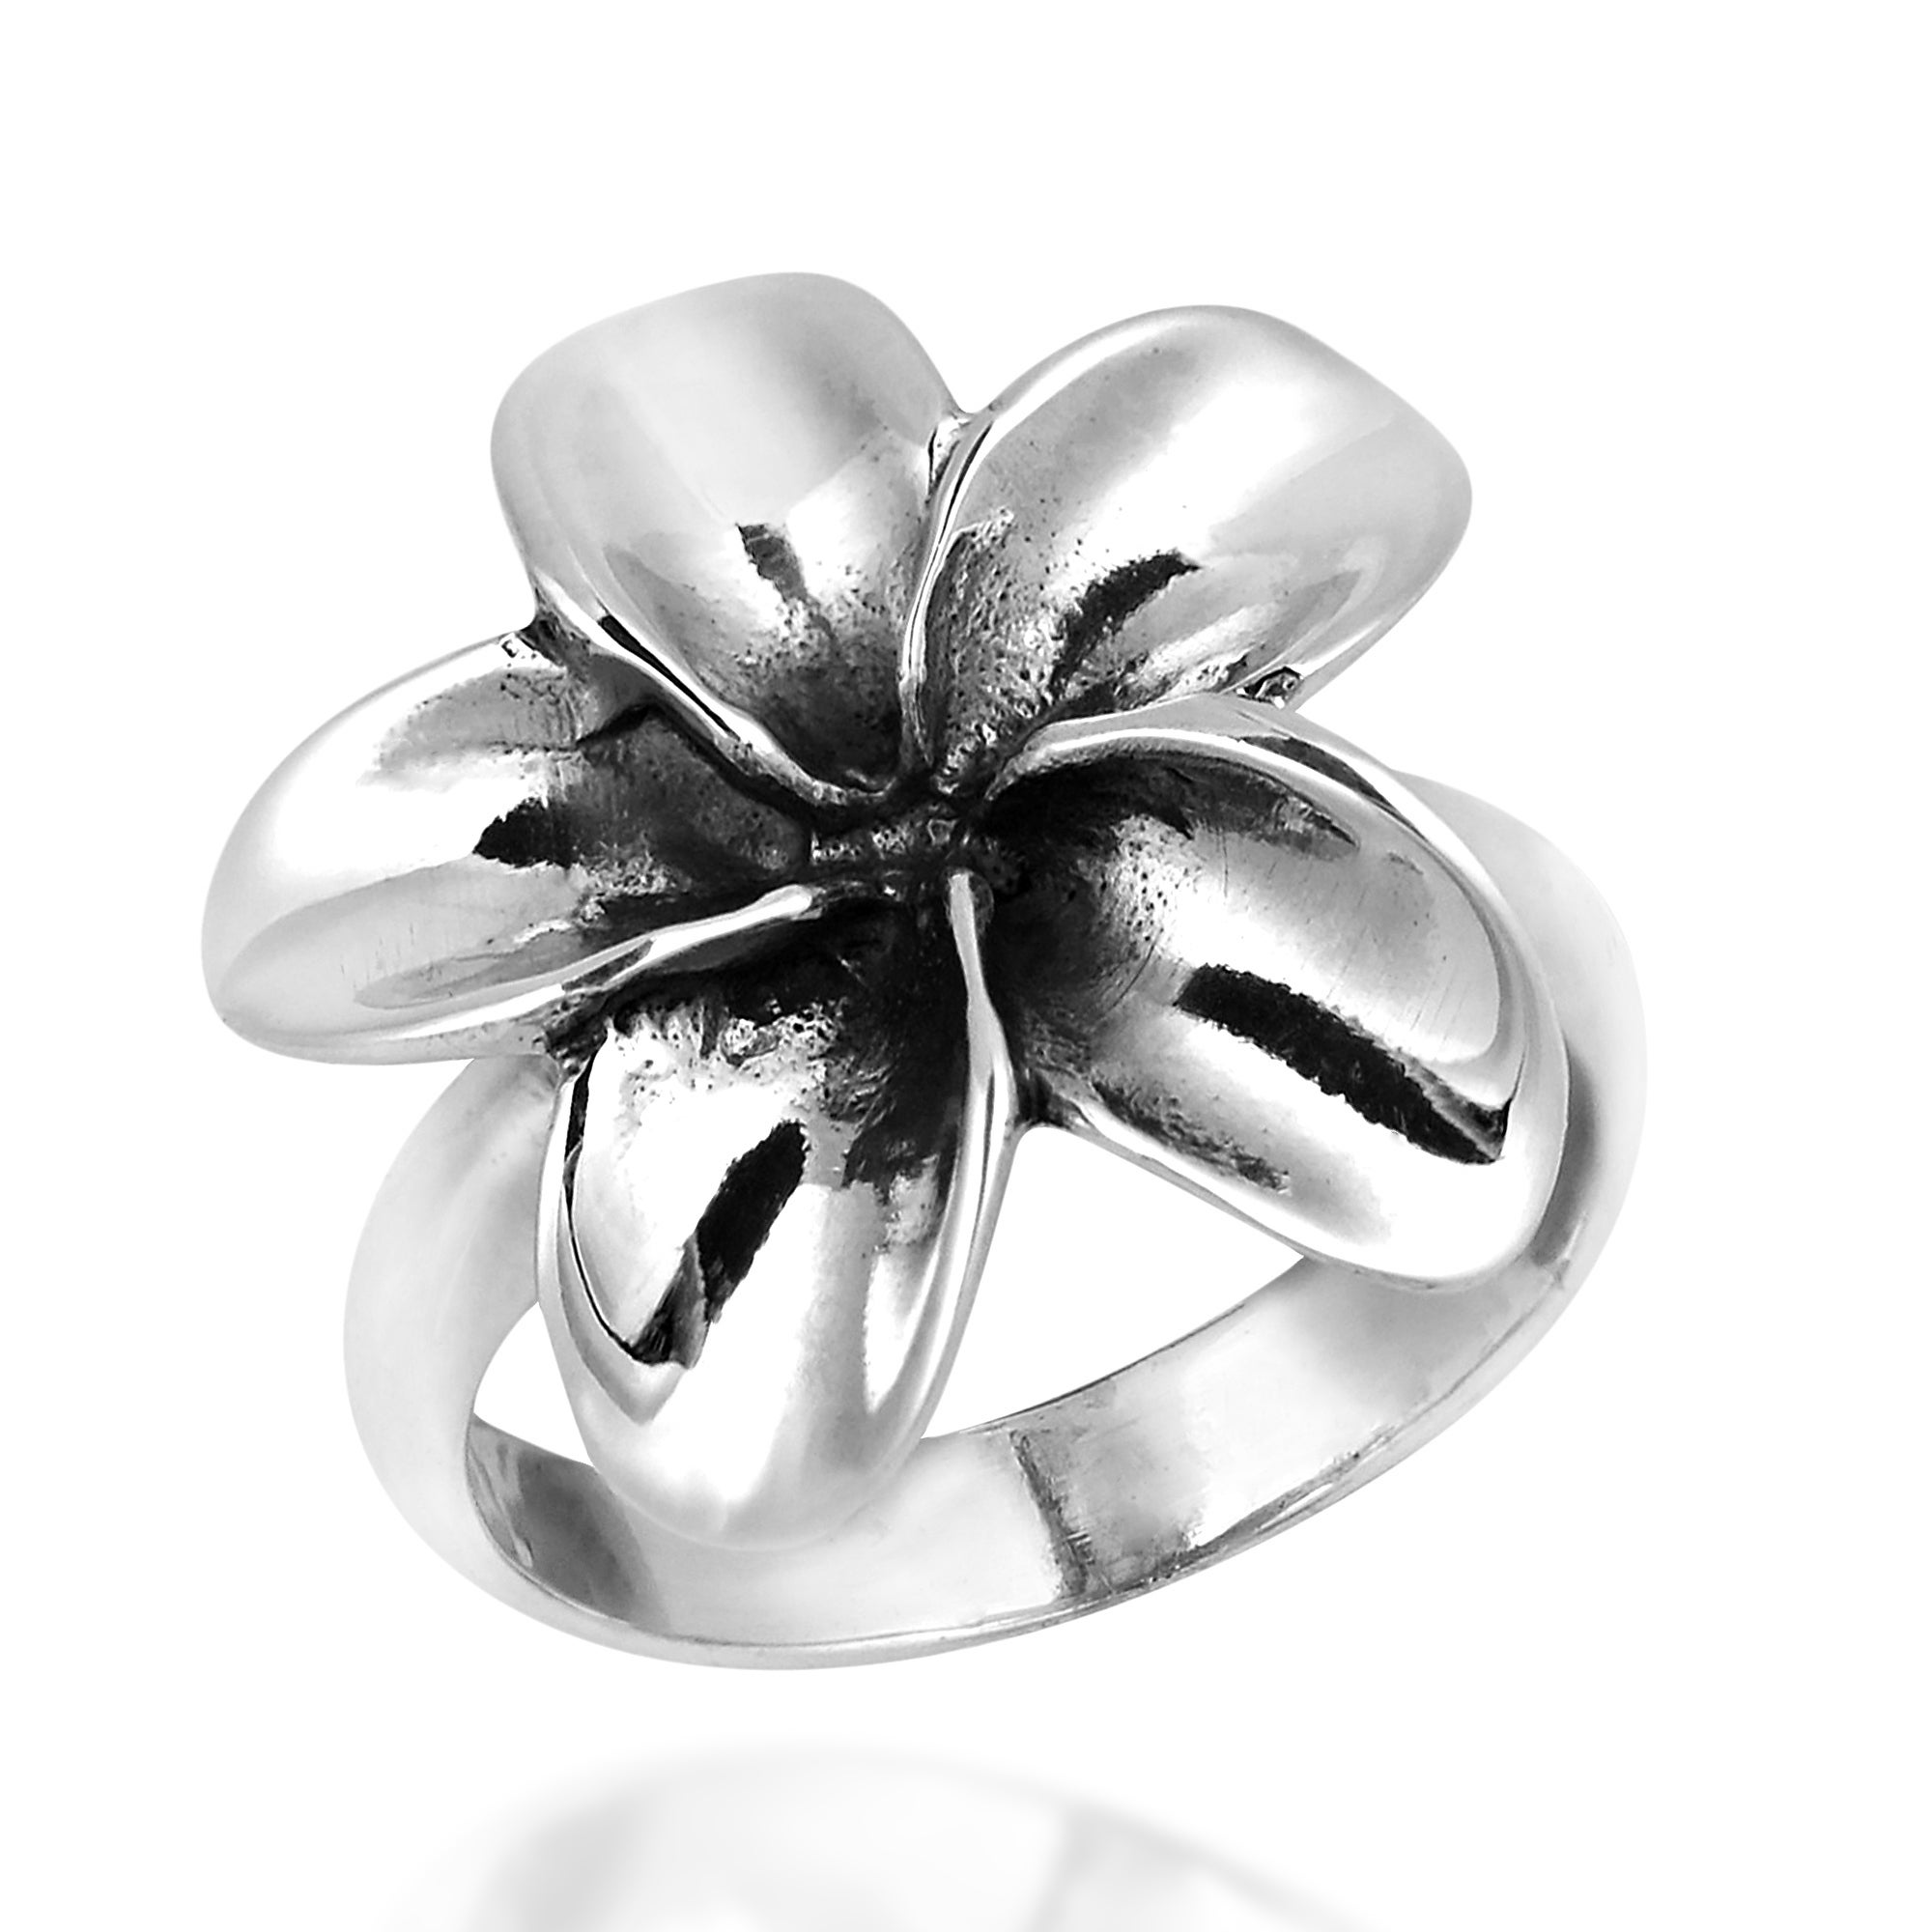 Shop handmade sterling silver sweet hawaiian plumeria flower ring shop handmade sterling silver sweet hawaiian plumeria flower ring thailand free shipping on orders over 45 overstock 7708560 izmirmasajfo